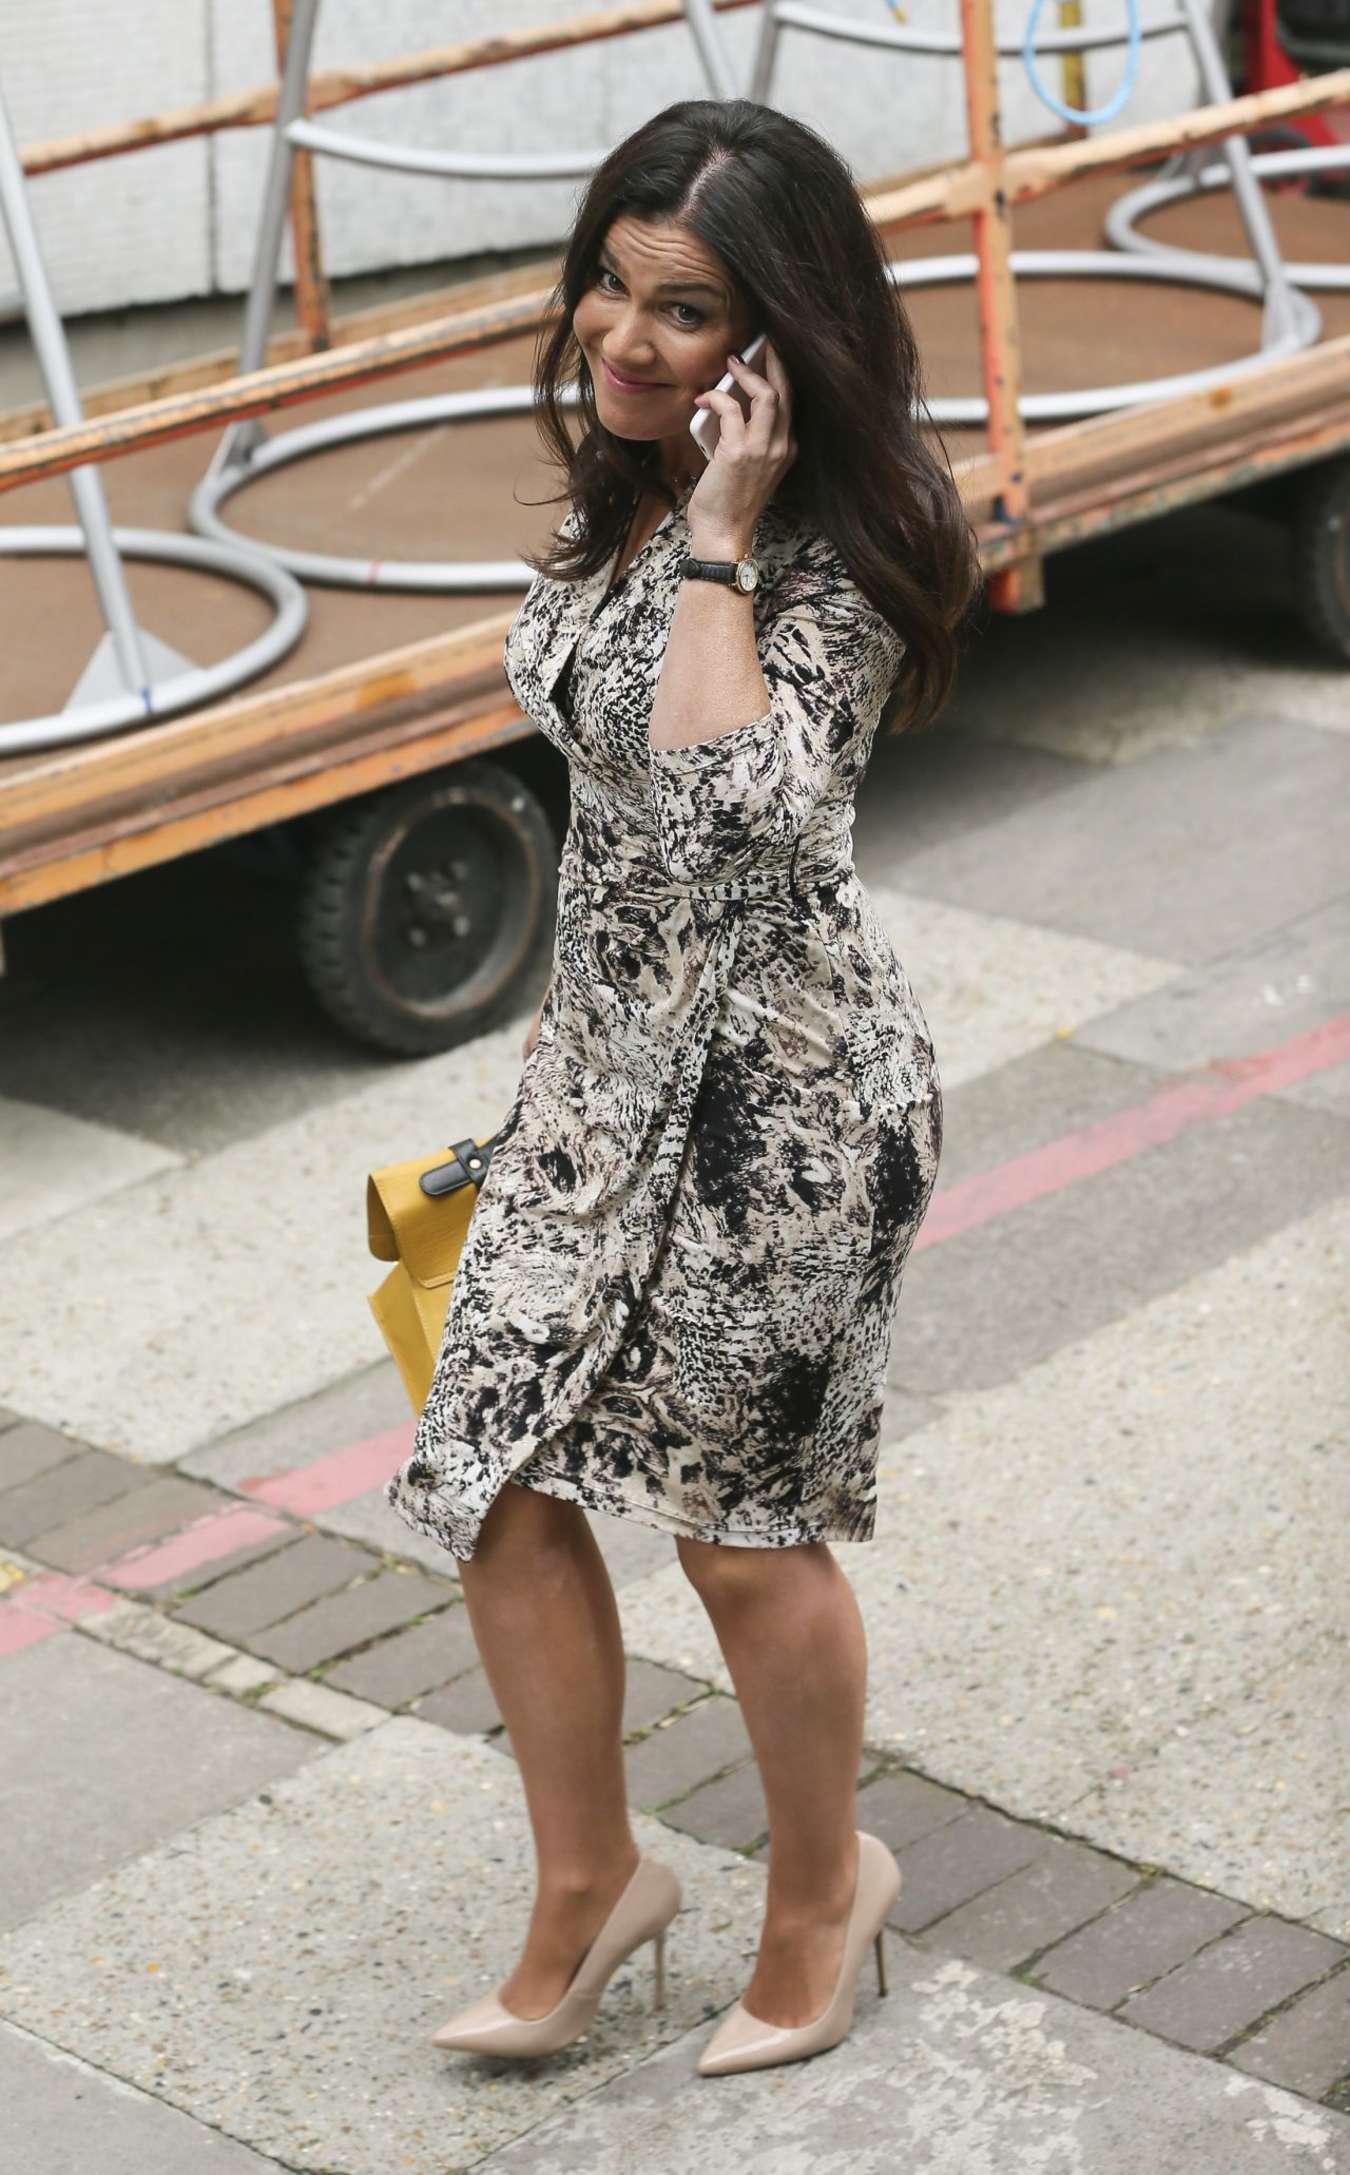 Susanna Reid Leaving the London Studios